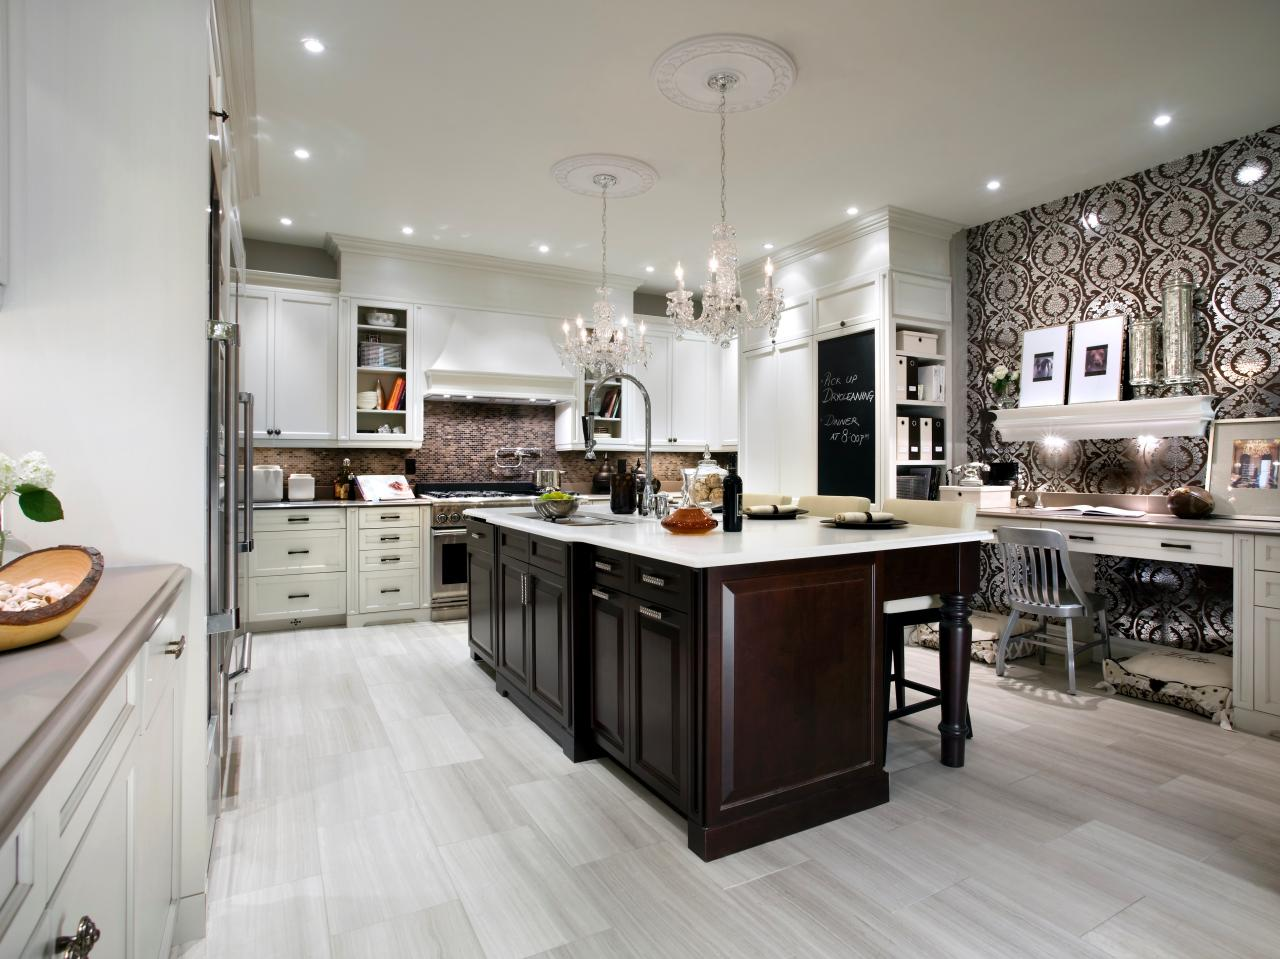 candice olson grey kitchen photo - 5